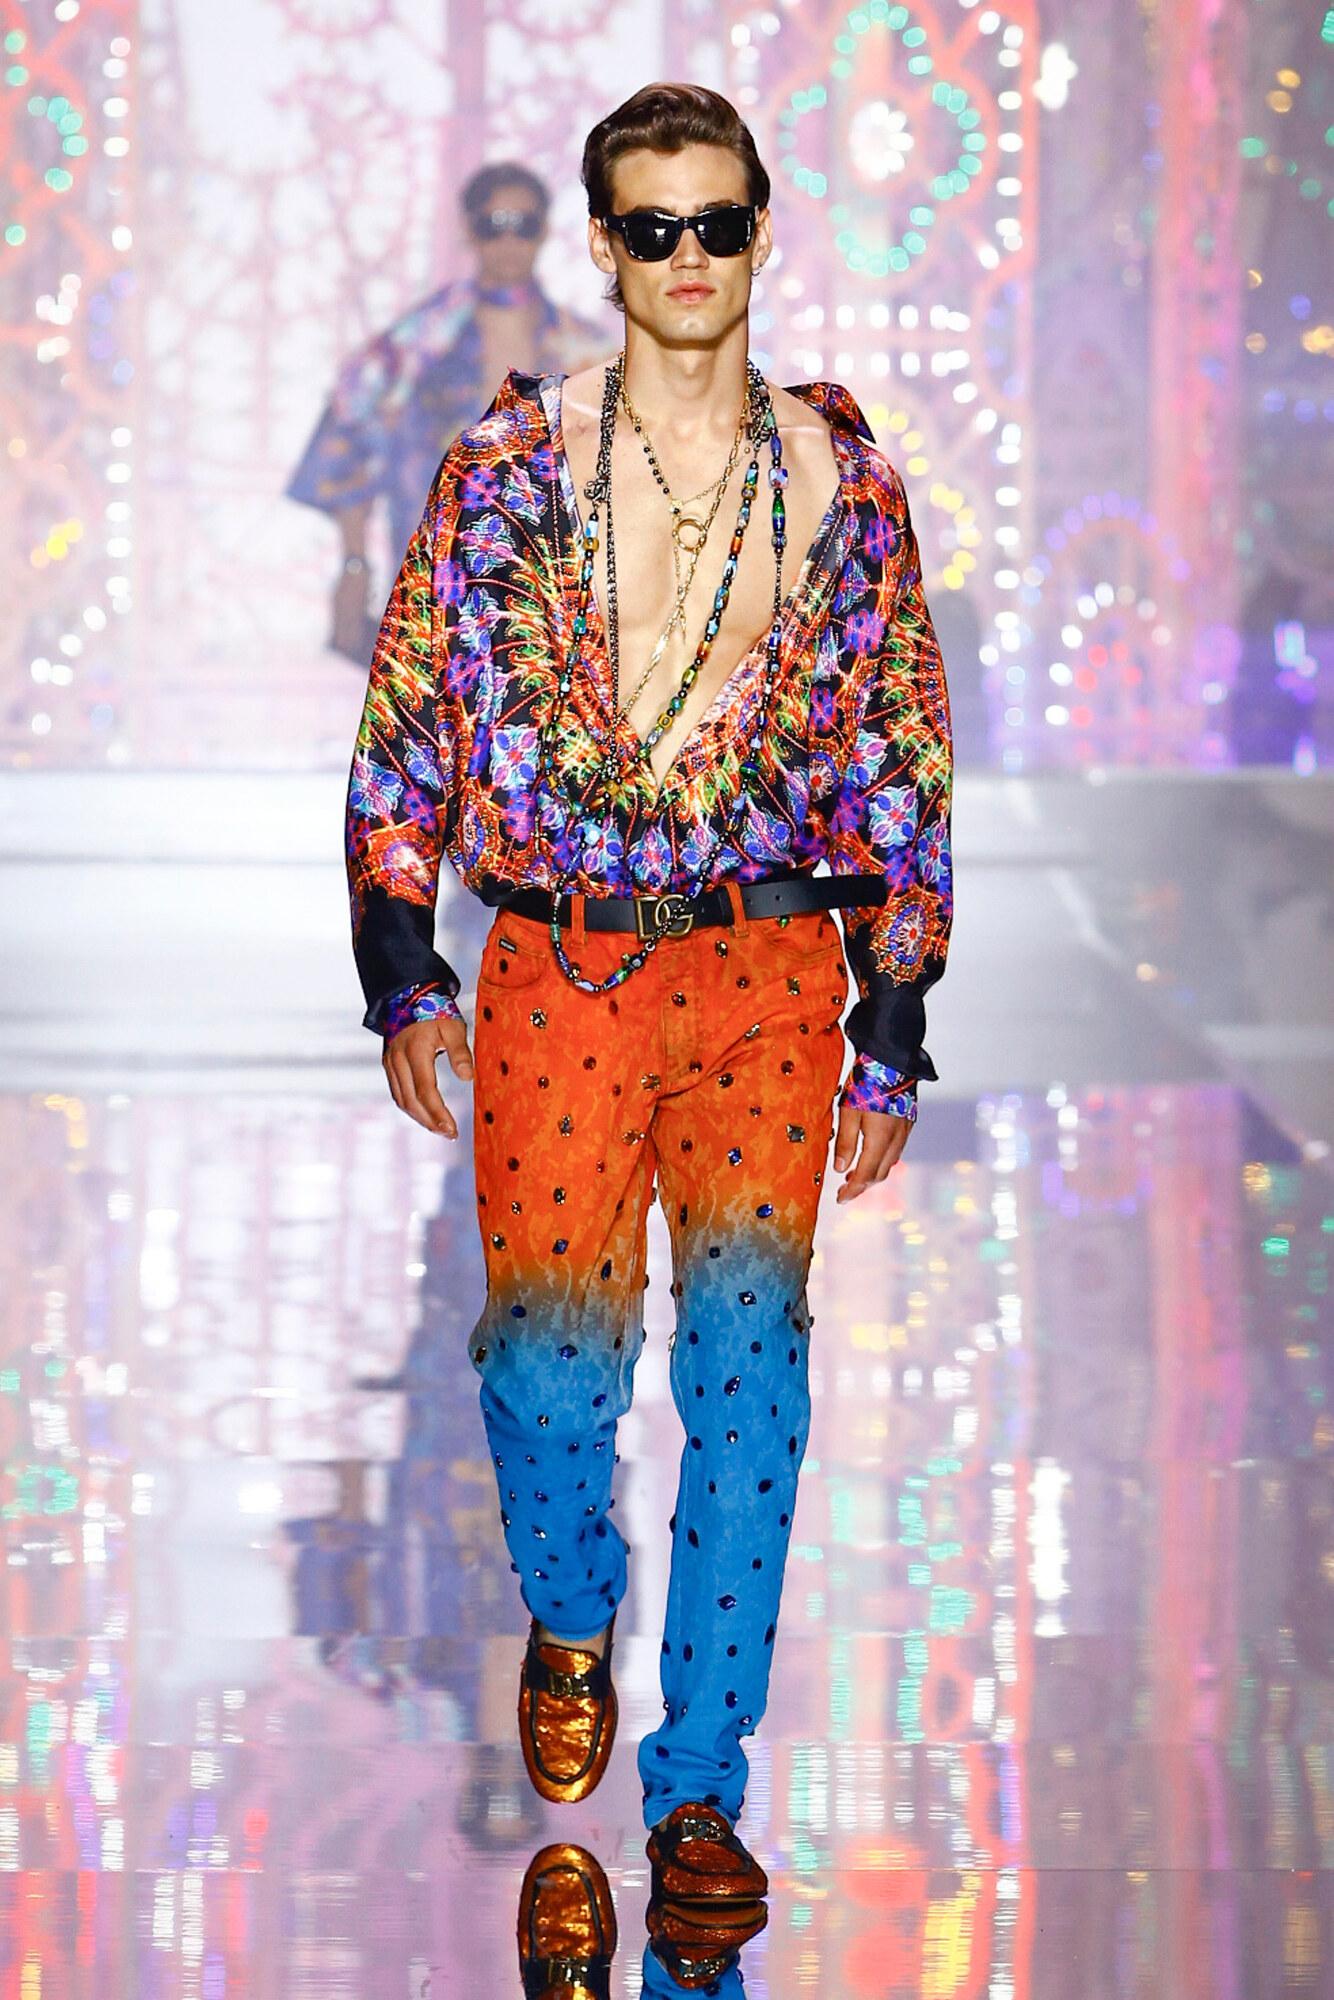 Dolce&Gabbana PE2022 DGLightTherapy